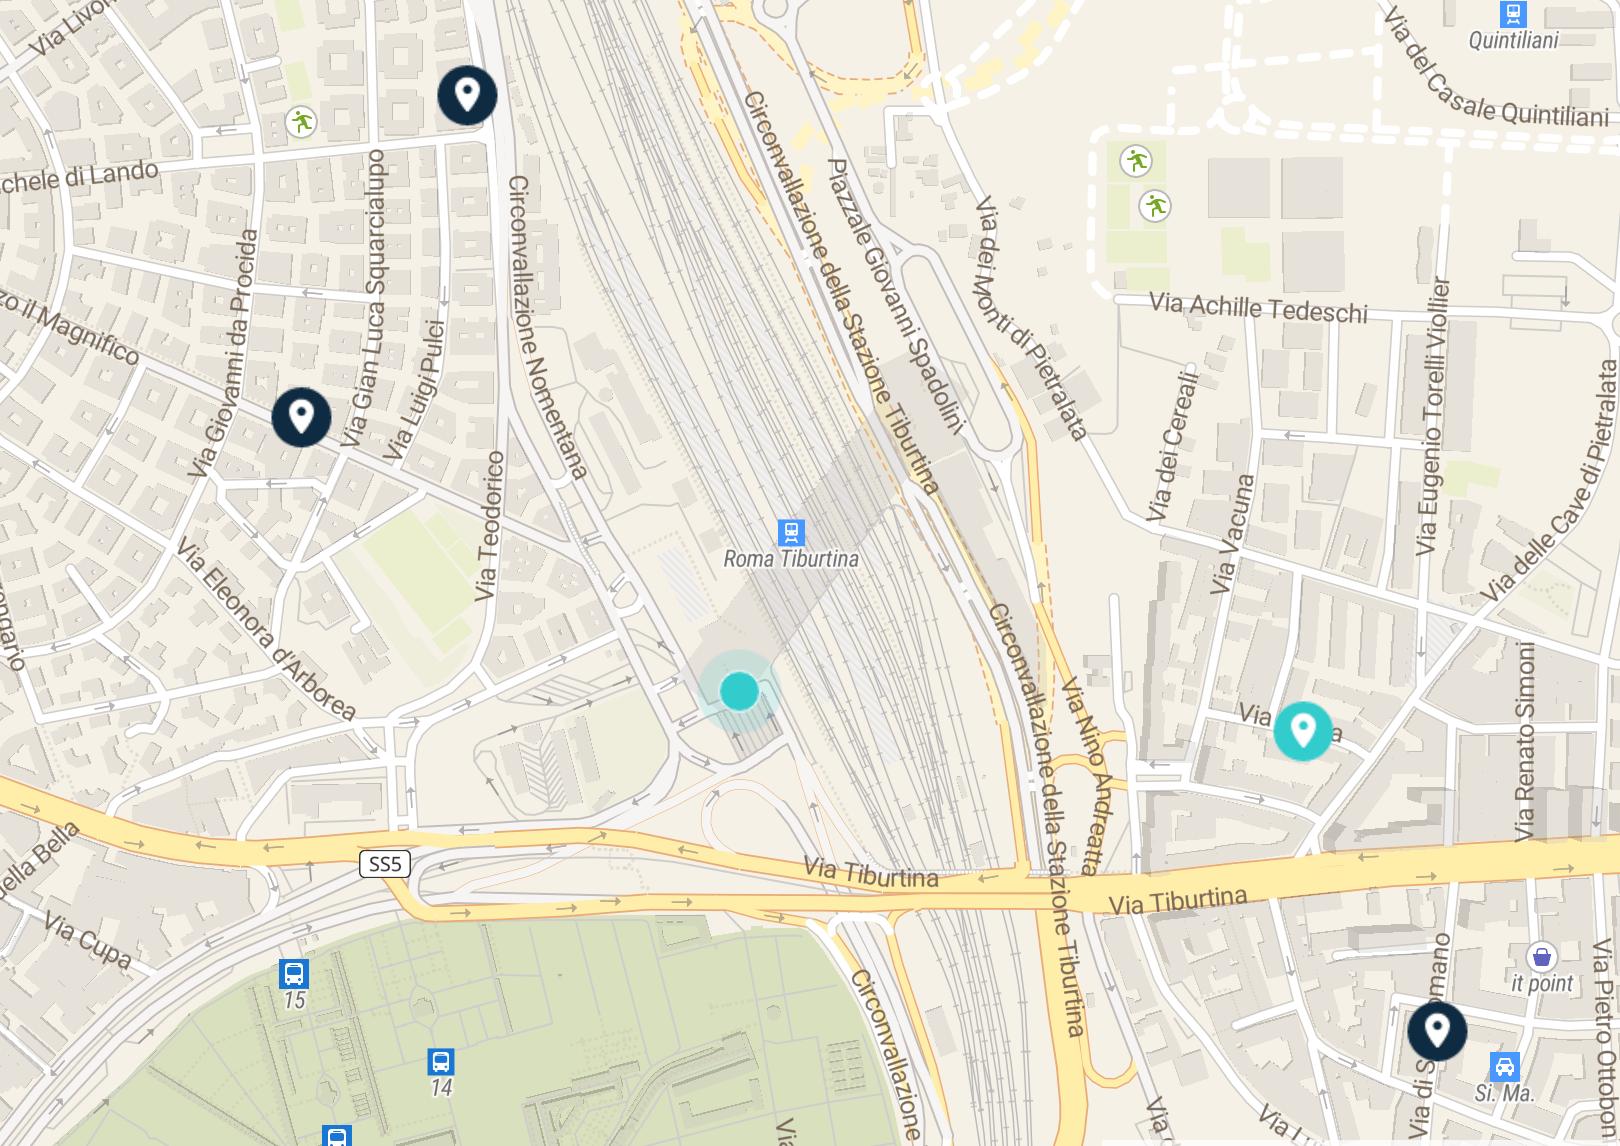 tiburtina station map: luggage storage